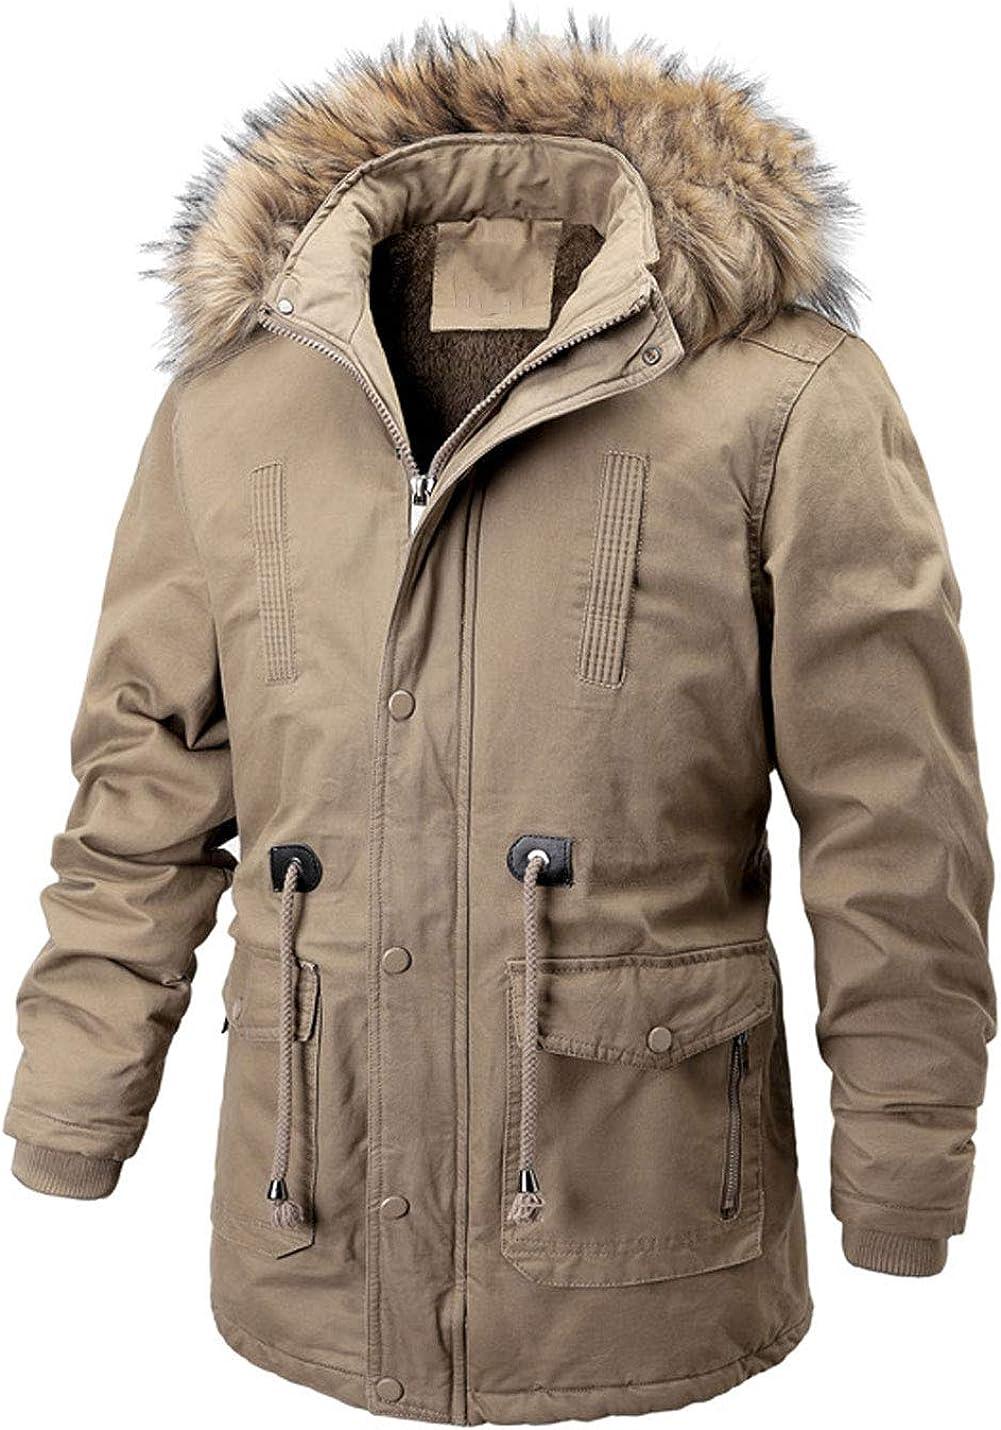 Yeokou Mens Casual Mid Long Fleece Lined Faux Fur Trim Hoodie Parkas Winter Coats